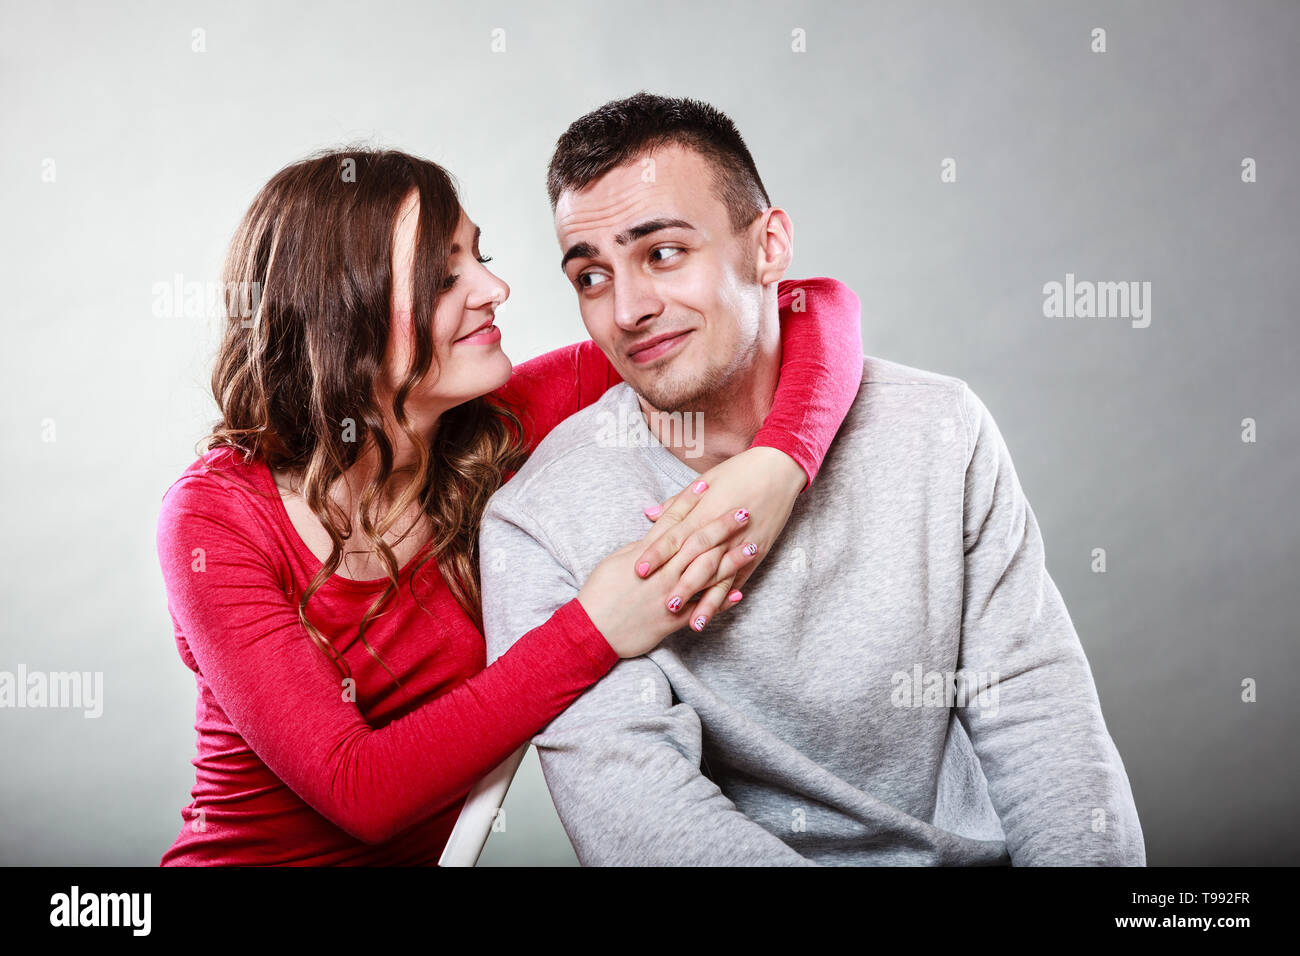 Happy smiling young couple hugging embracing. Joyful man and woman having nice time. Love. Good relationship. - Stock Image